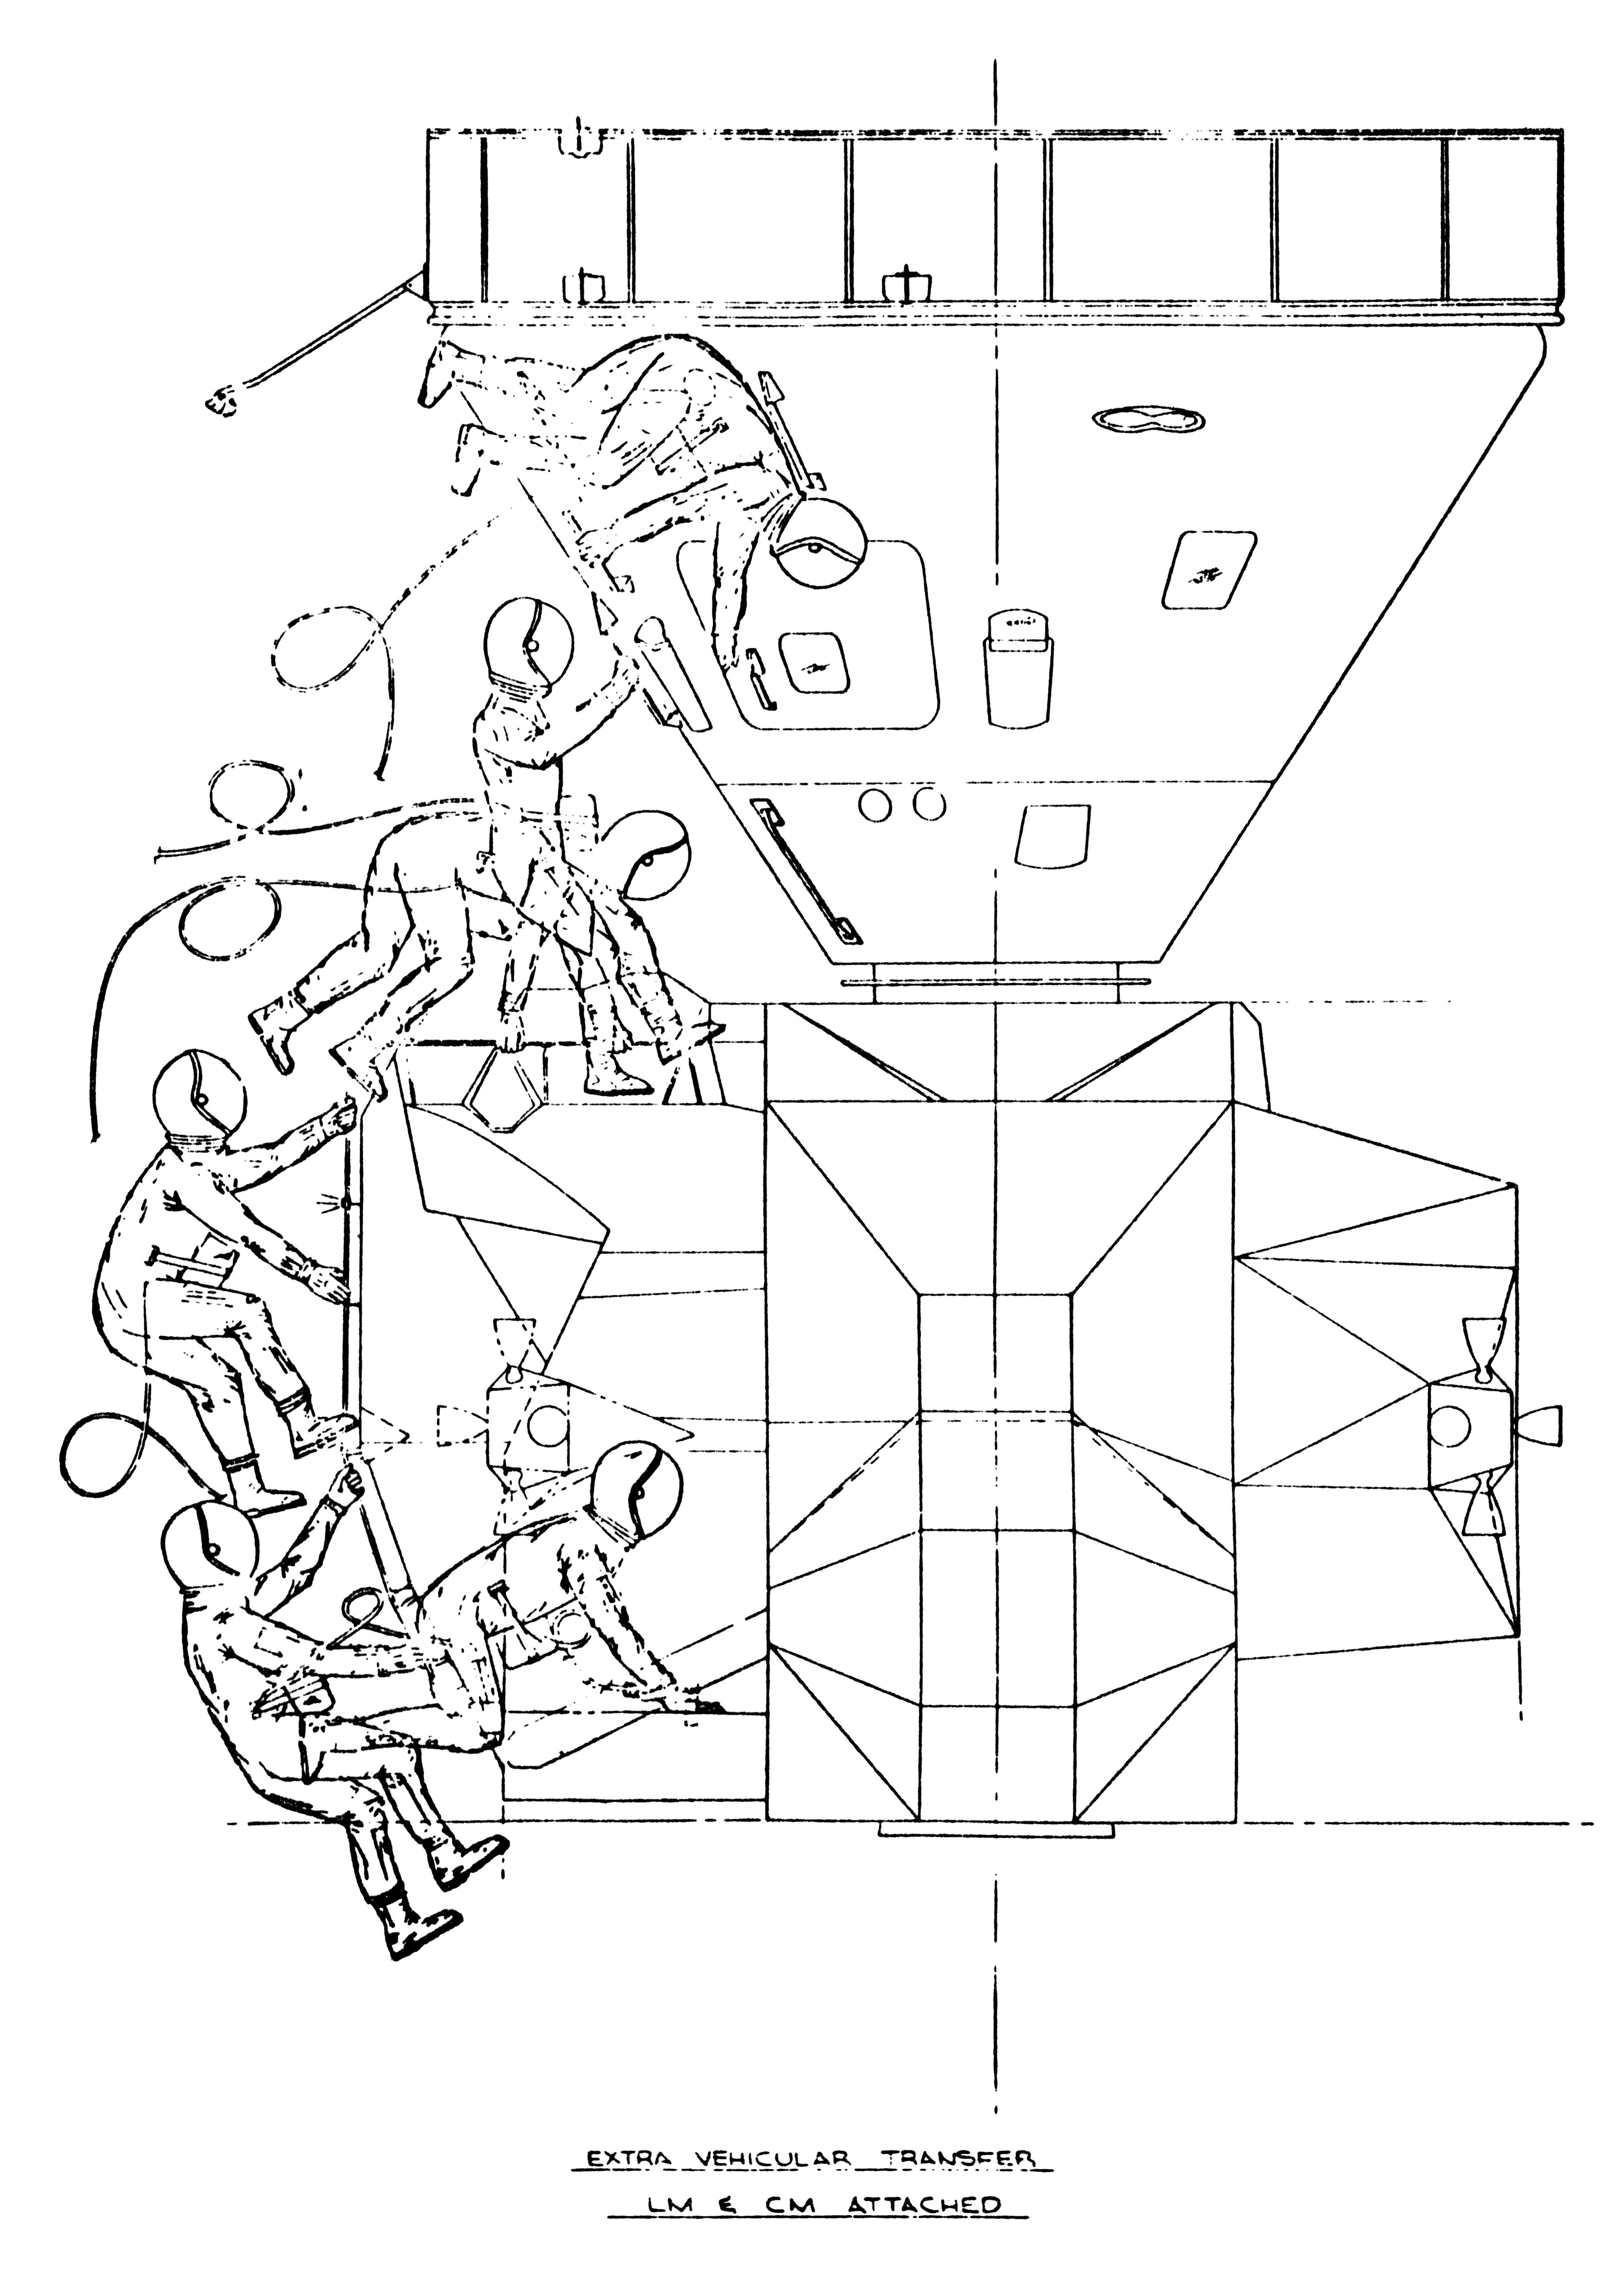 Lm To Cm Extravehicular Transfer